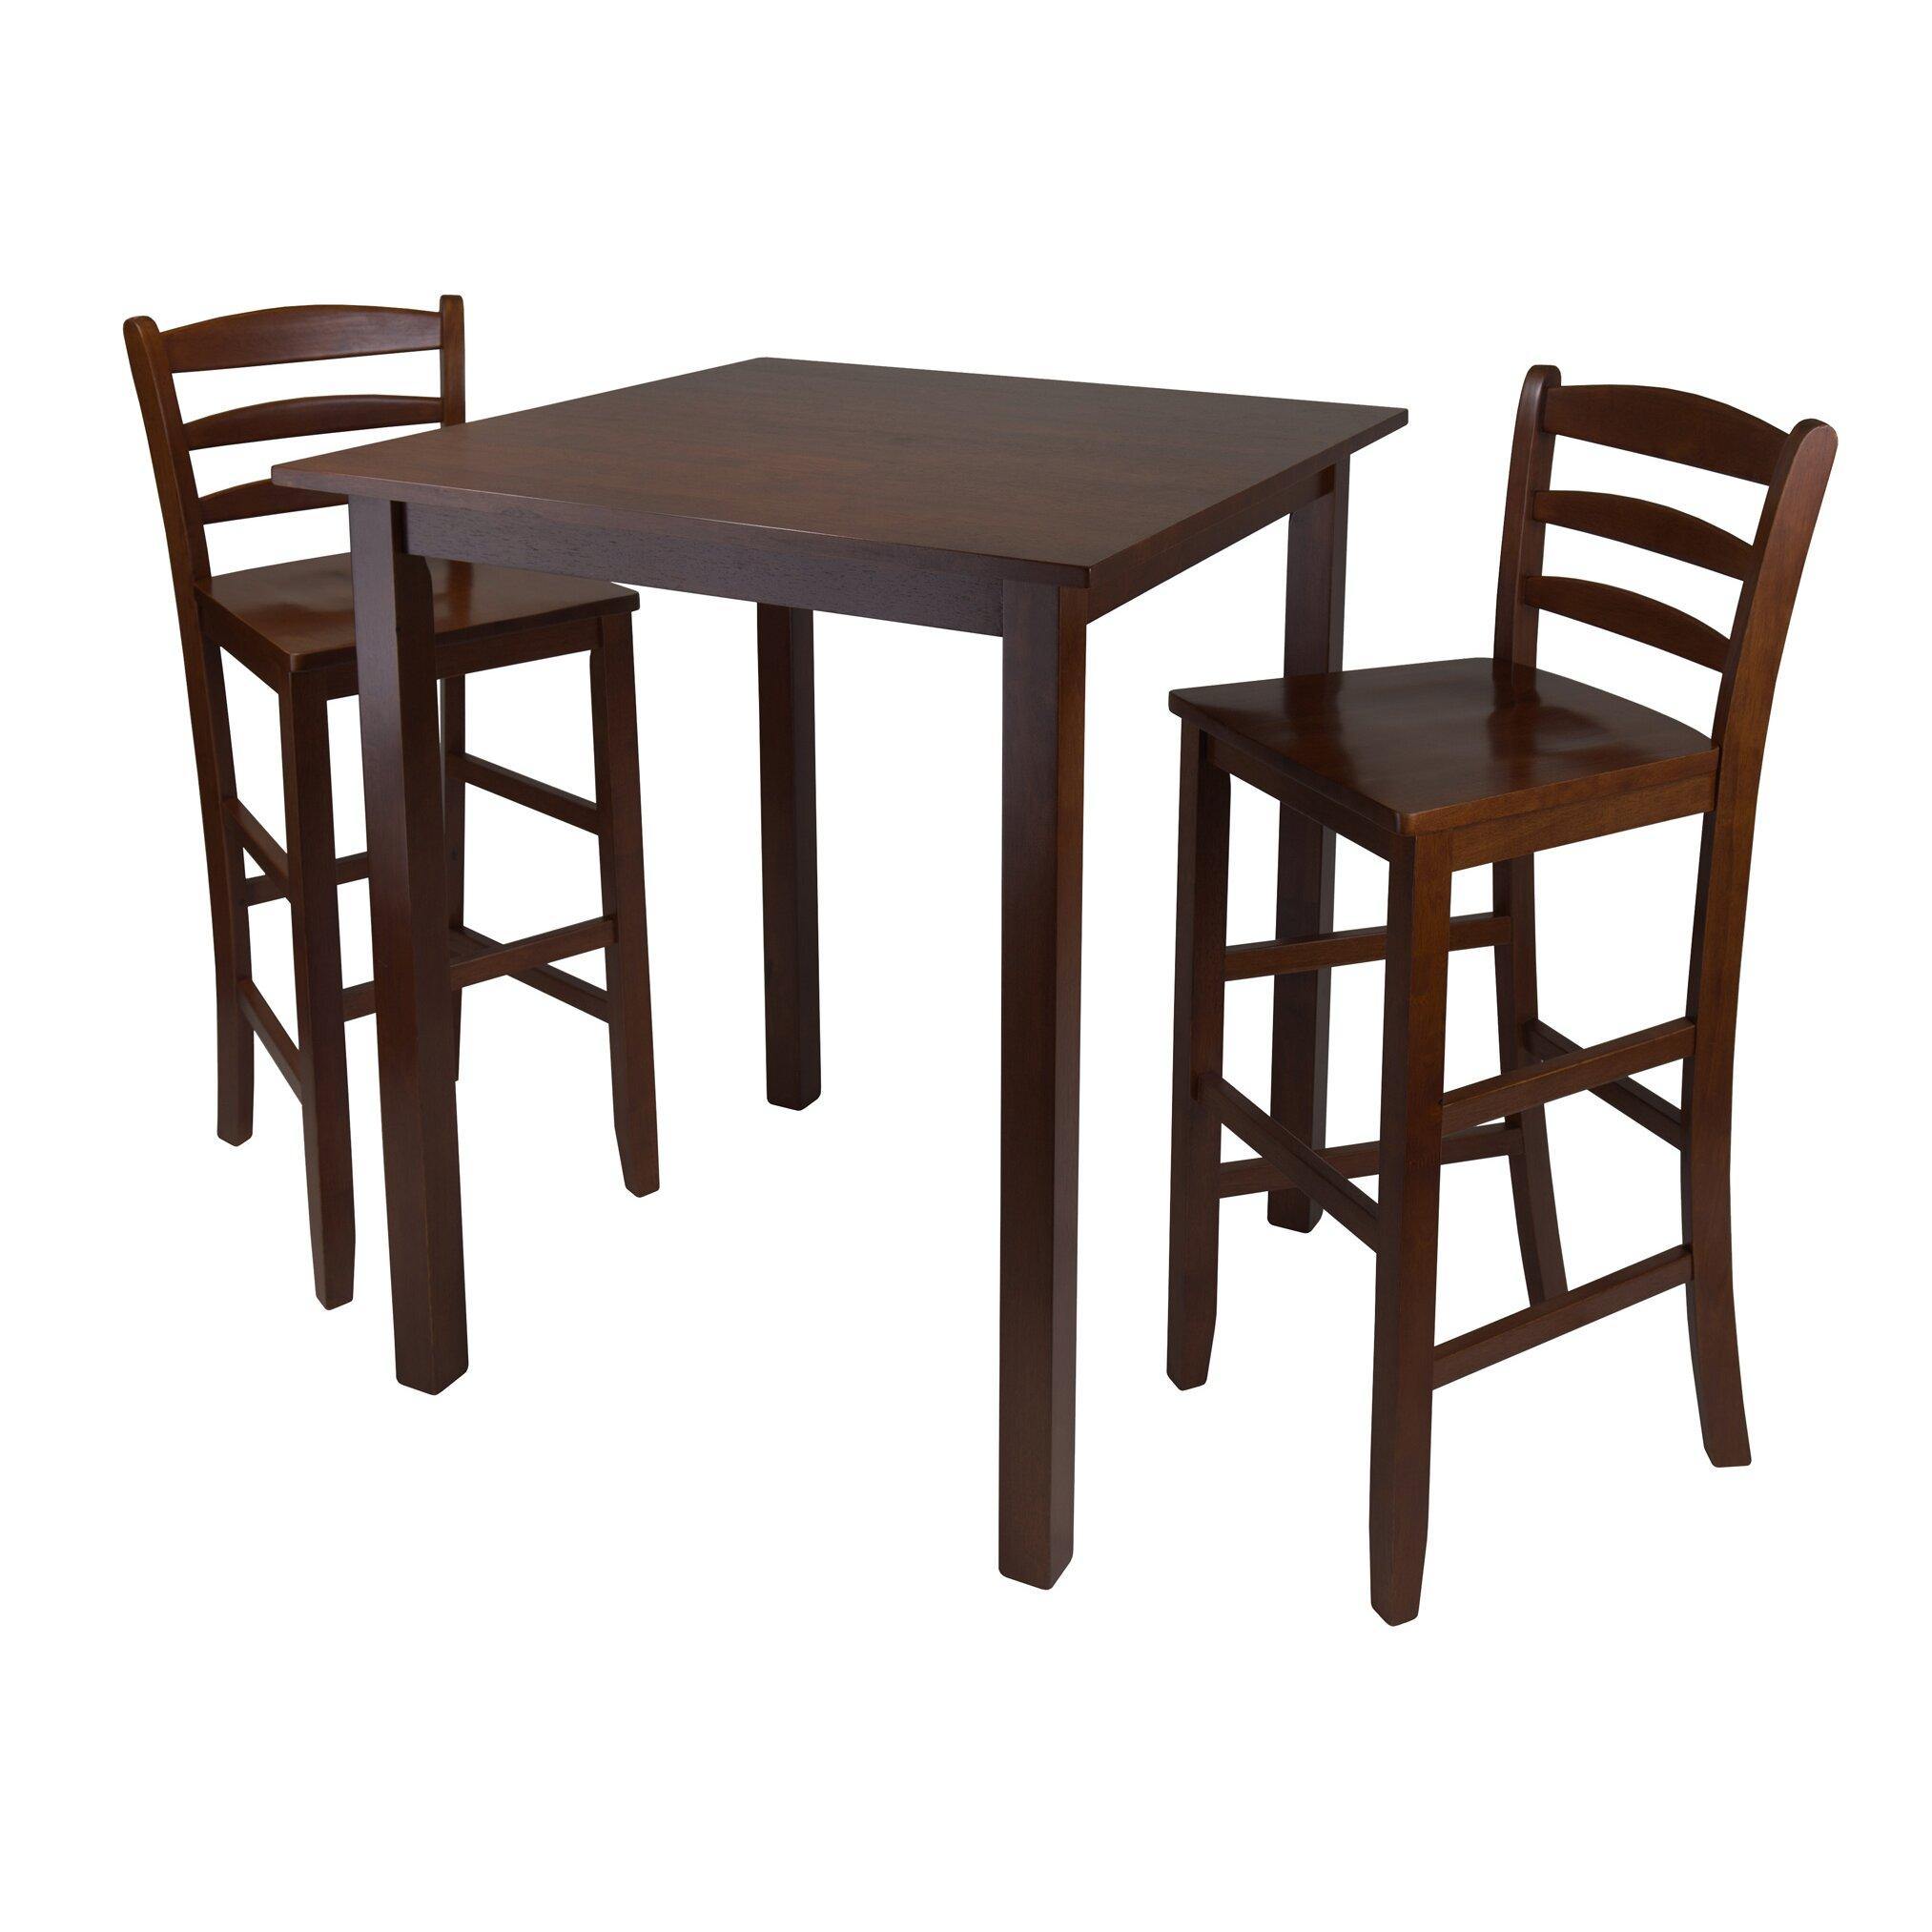 Kitchen Pub Table And Chairs Red Barrel Studio Auburn Road 3 Piece Pub Table Set Reviews